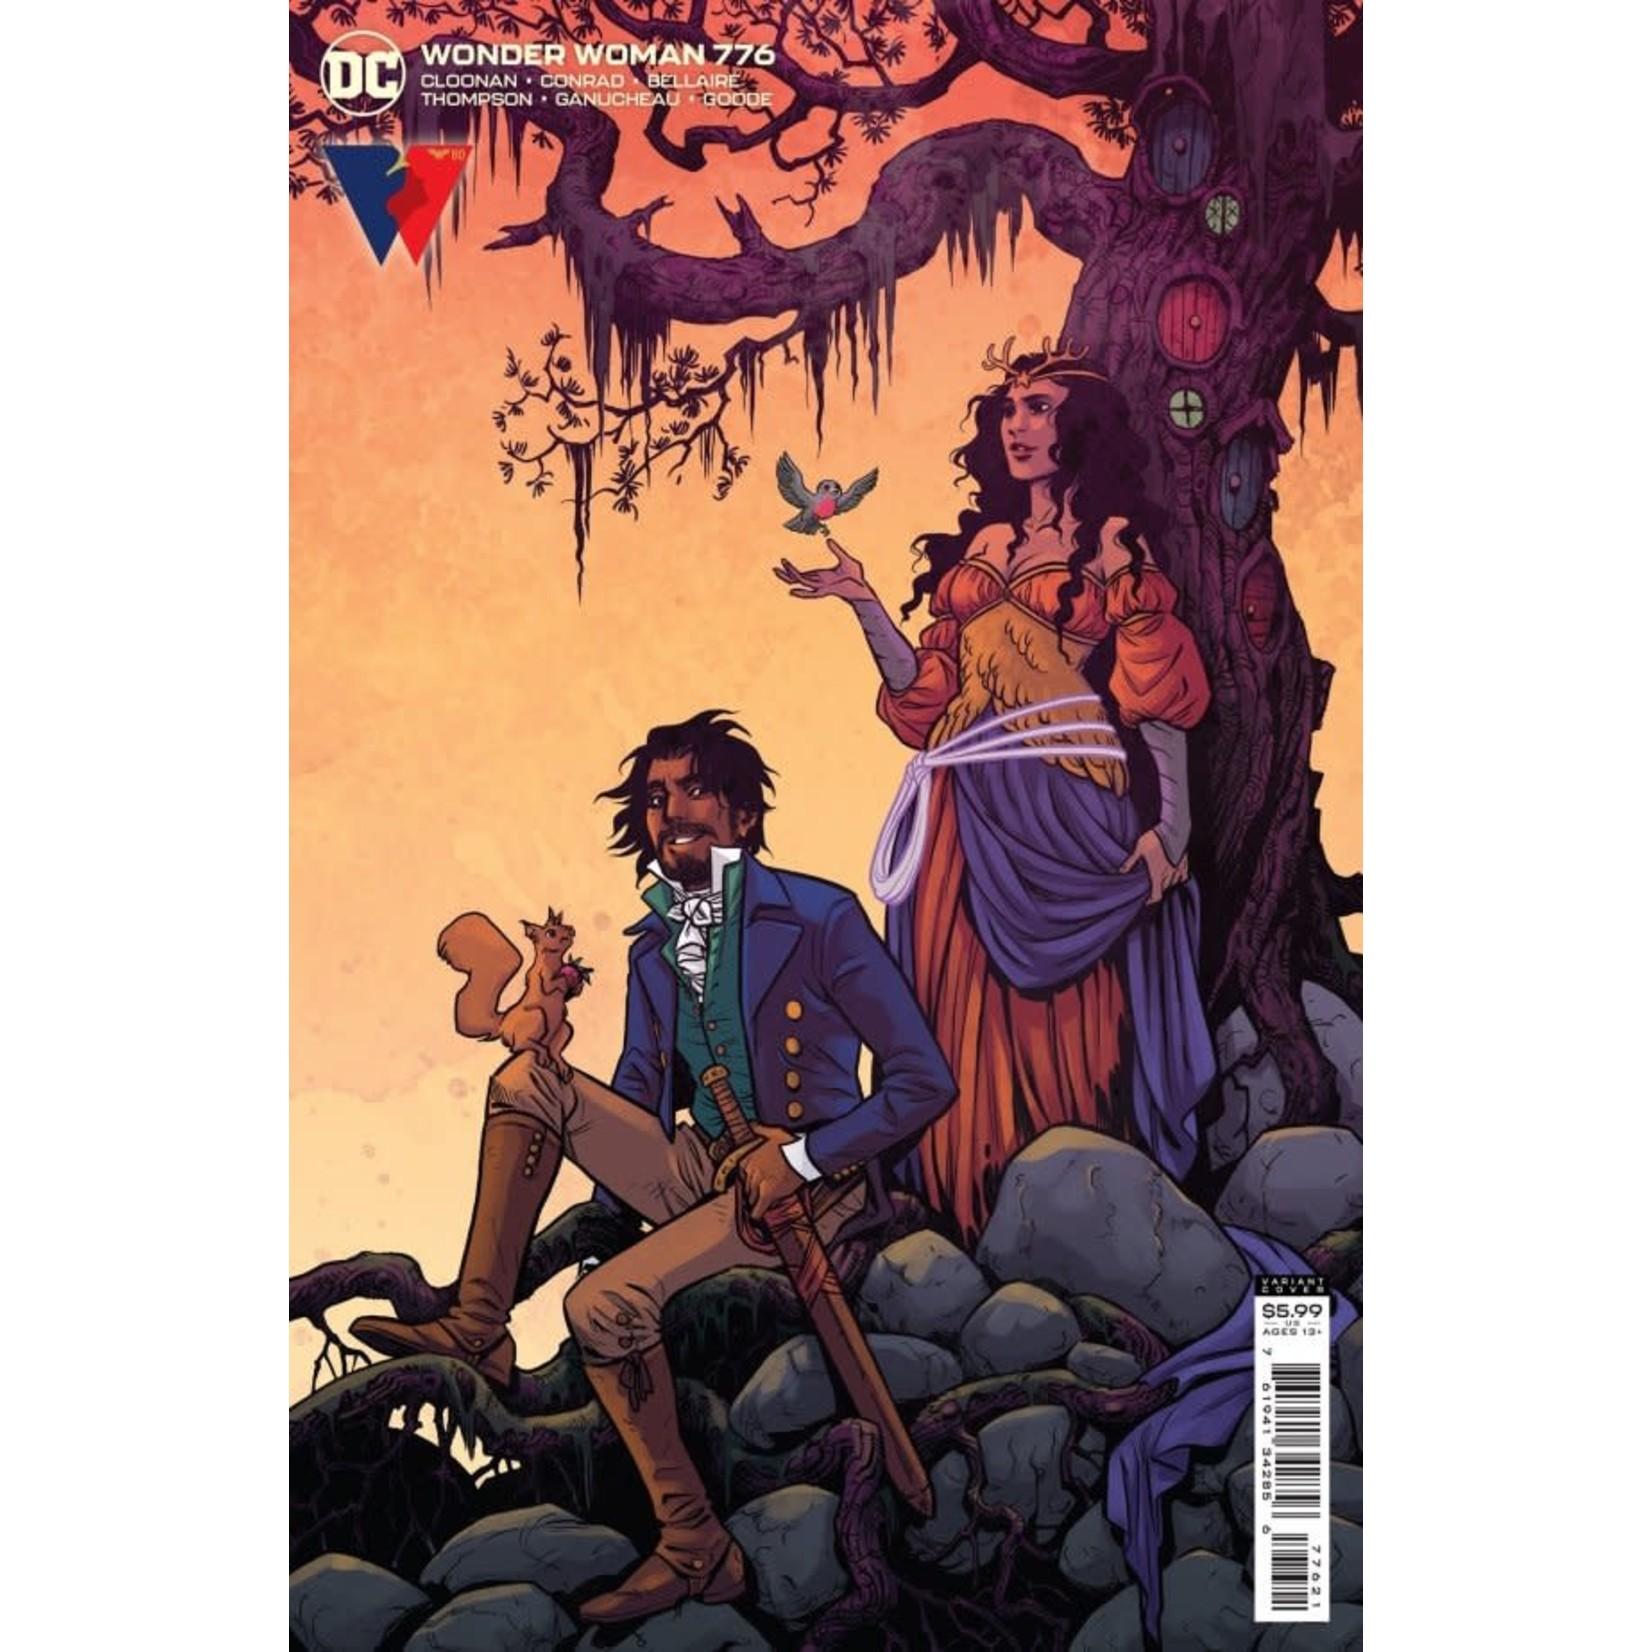 DC Comics Wonder Woman #776 Card Stock Variant Cover